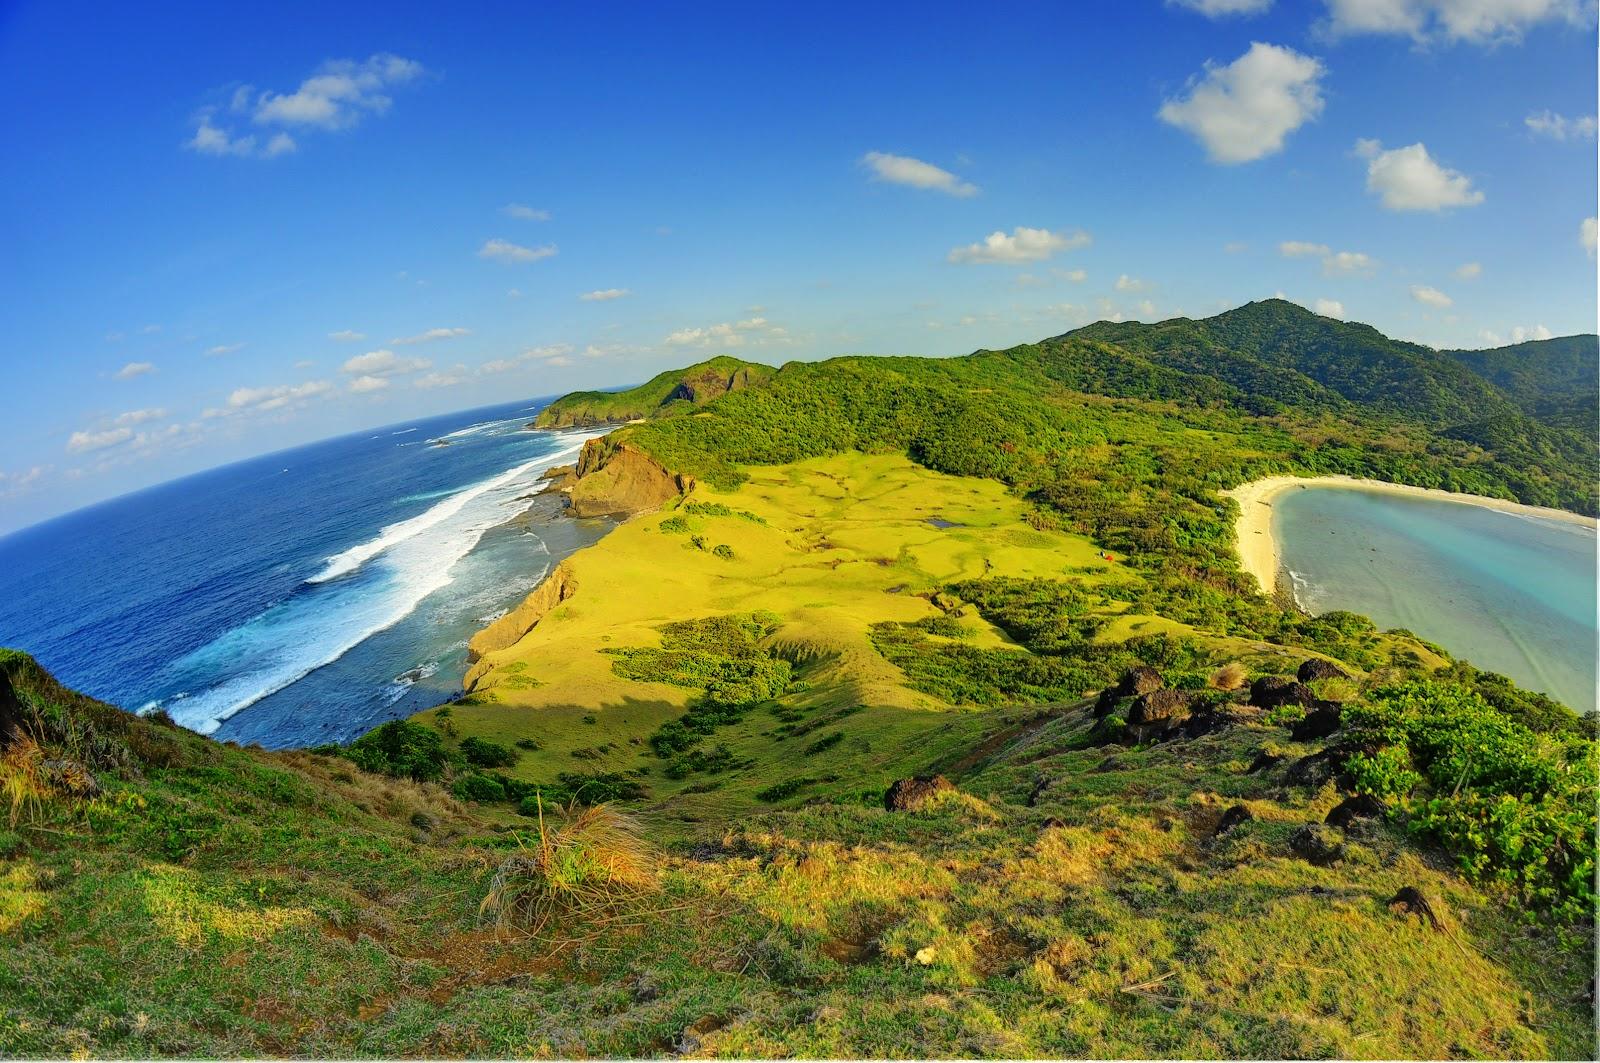 palaui-island-things-to-do.jpg